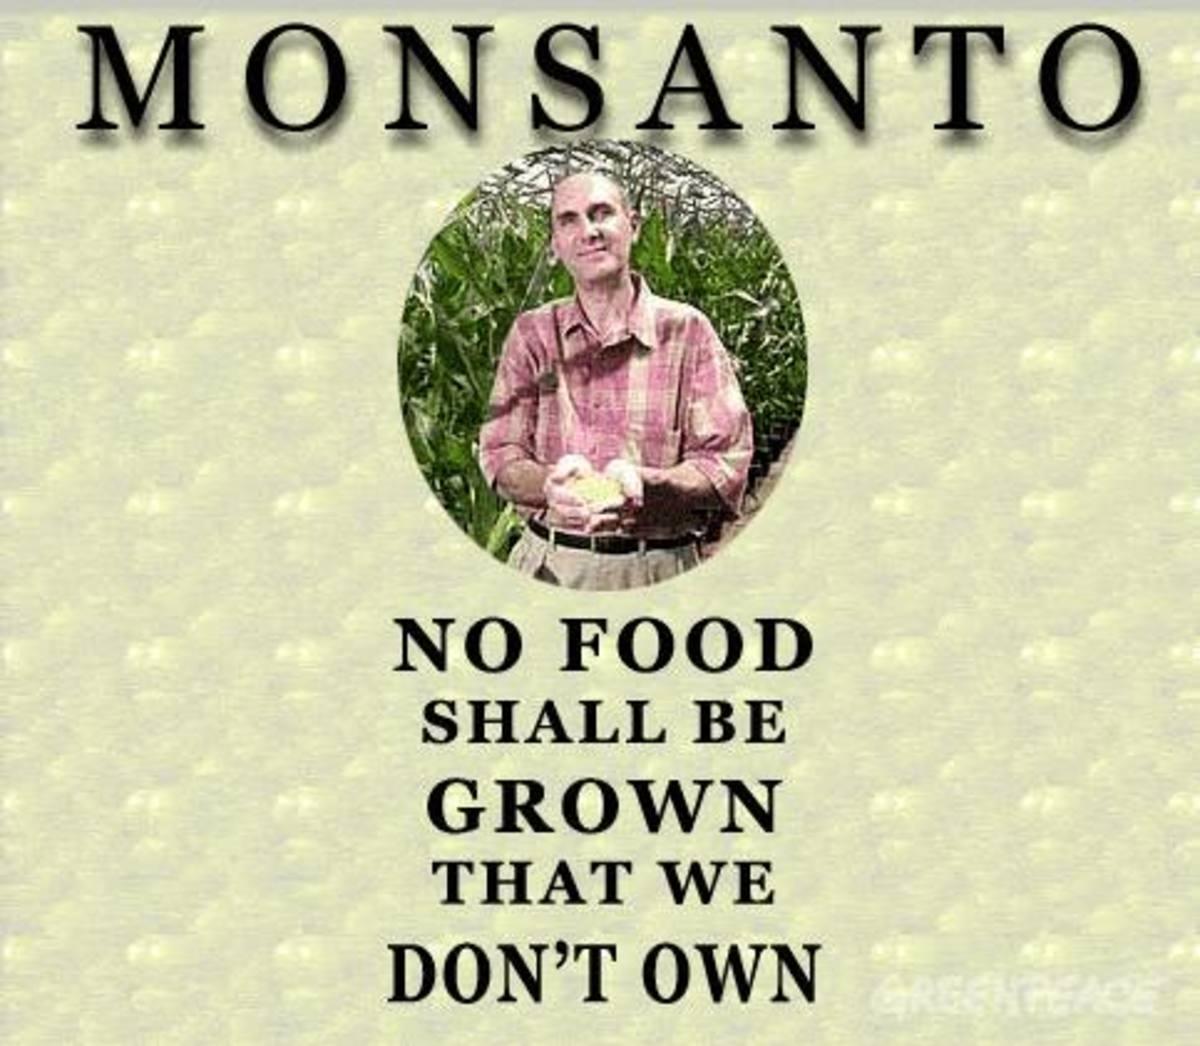 Monsanto: True to its creed and aim, worldwide